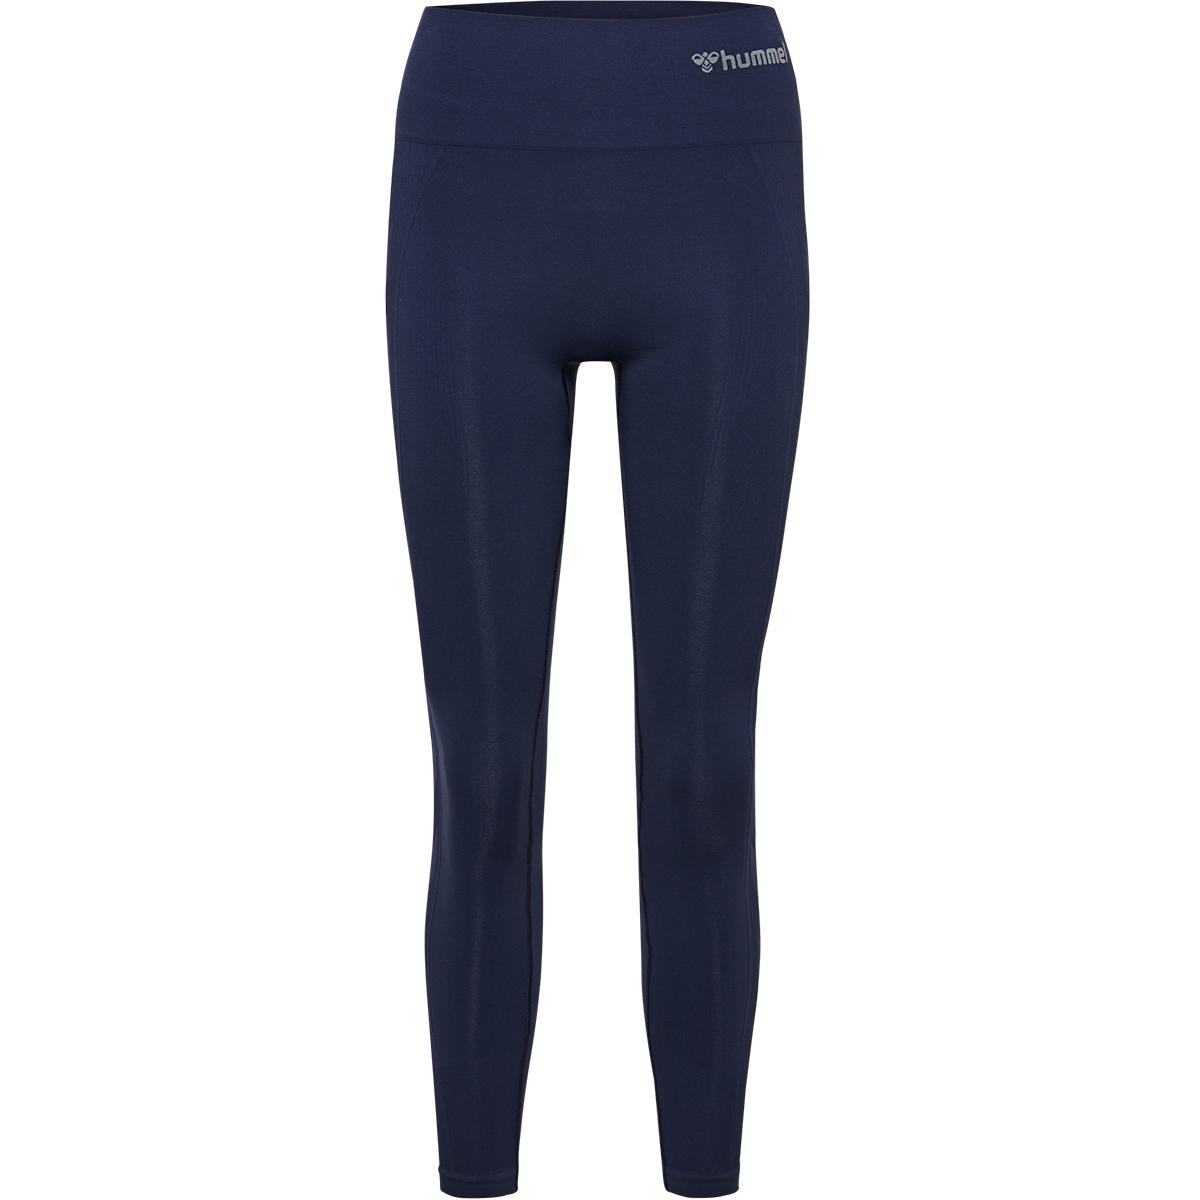 Hummel High Waist Seamless tights, marineblå, x-large/xx-large